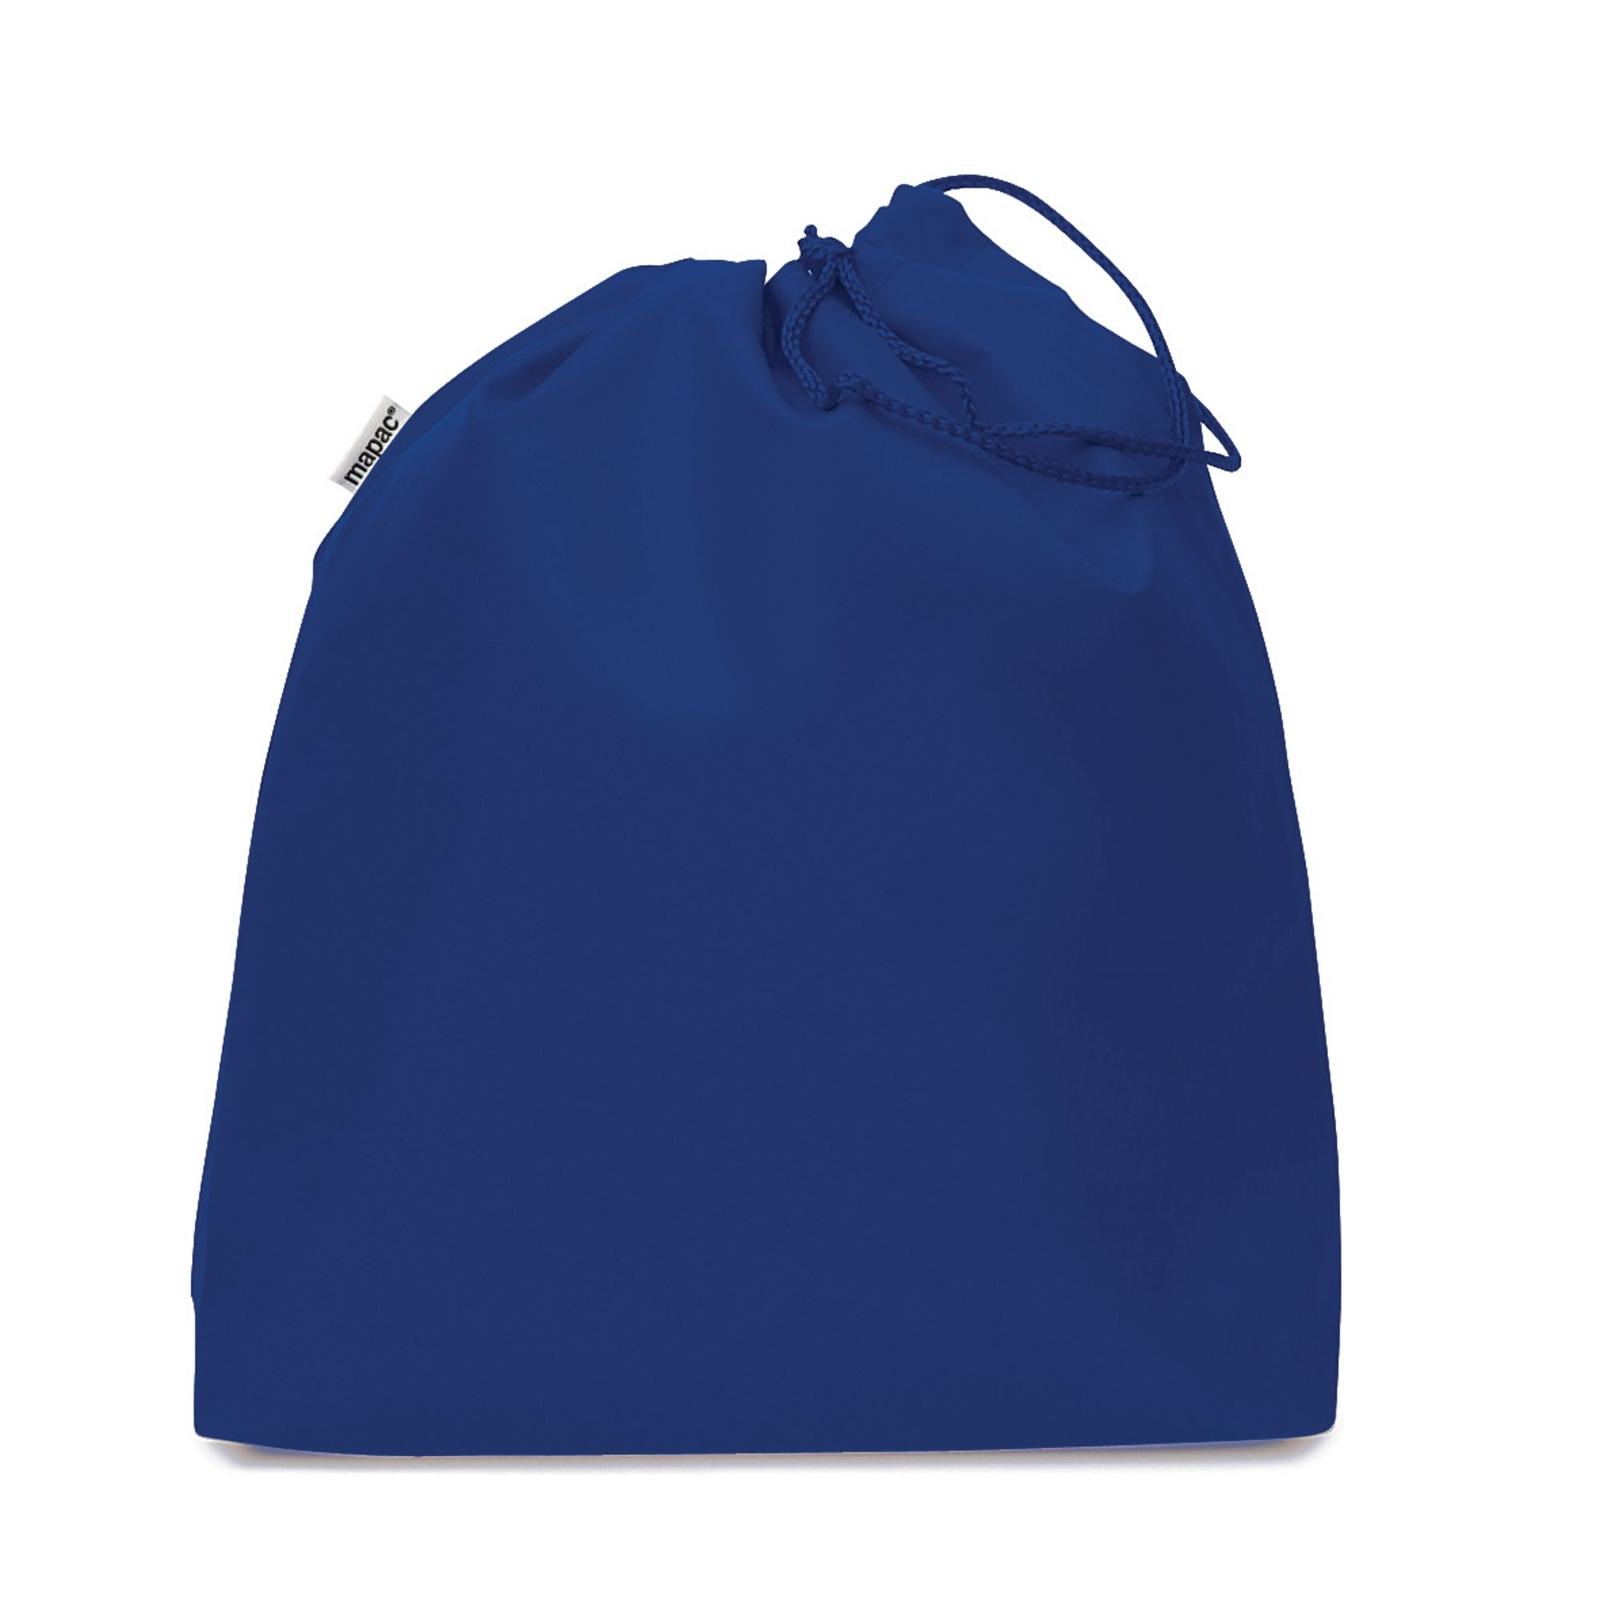 Plain Gym Bag Royal Blue - Pack of 25